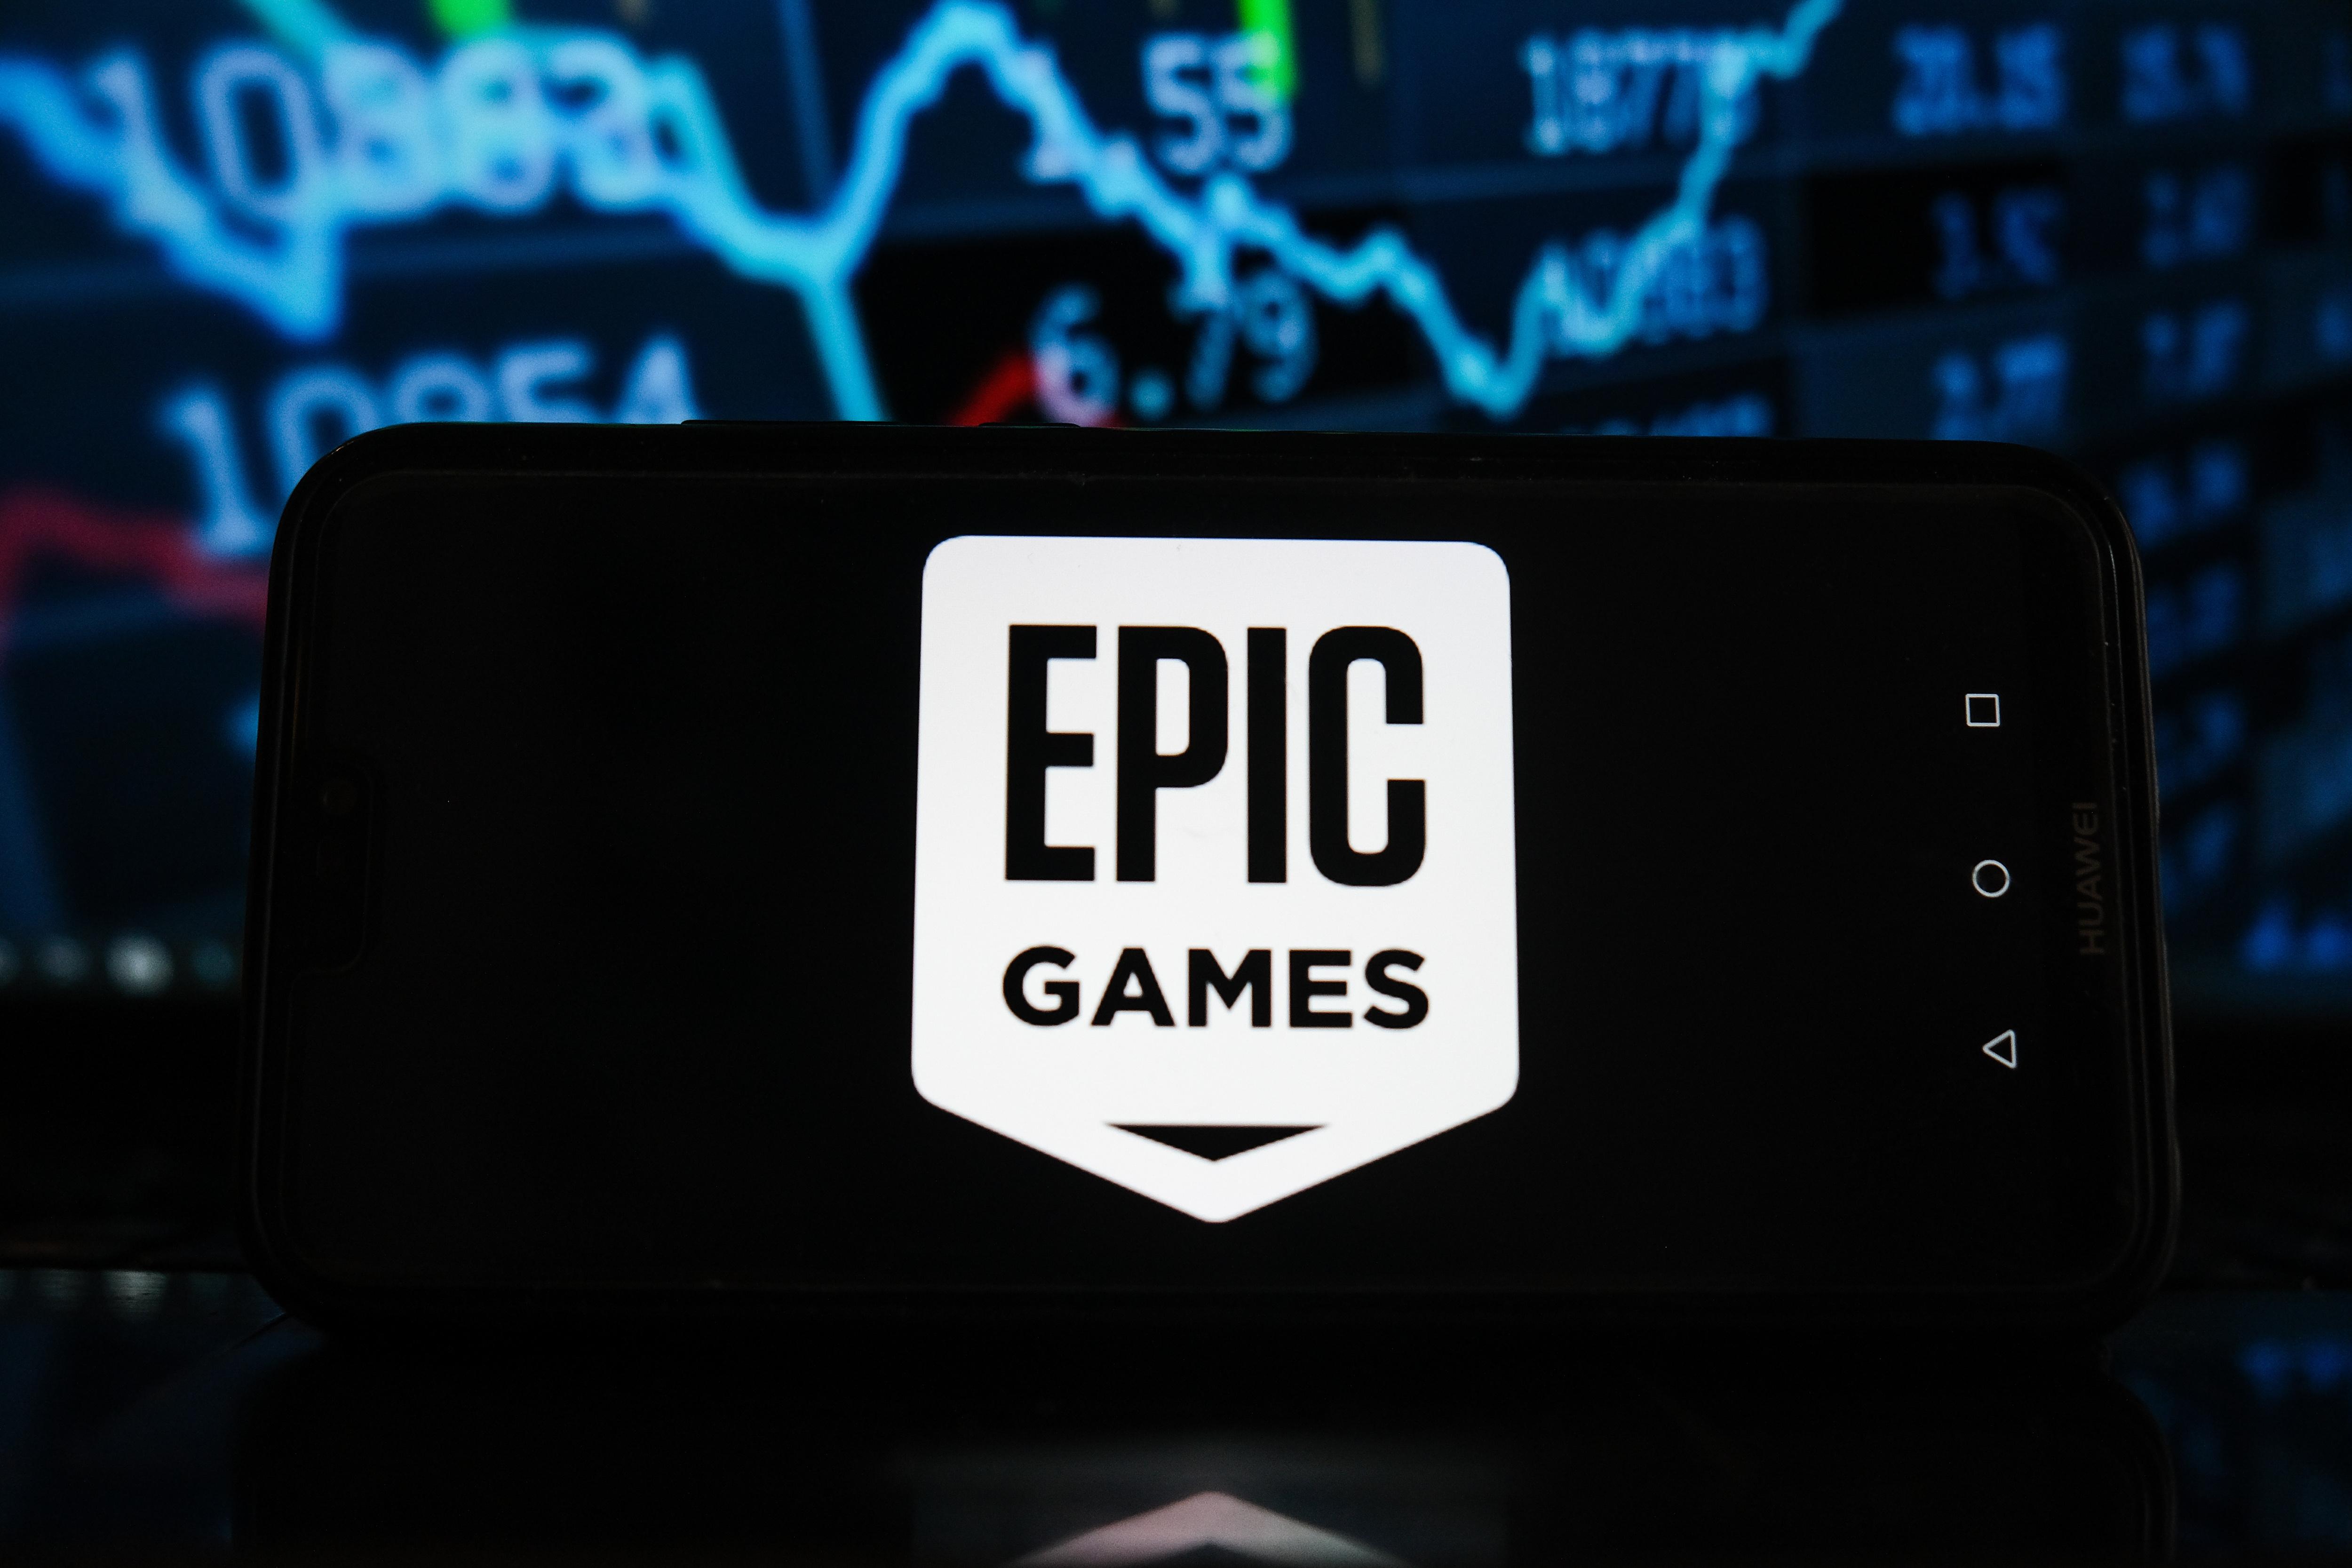 Epic announces billion-dollar funding round ahead of Apple trial – Engadget